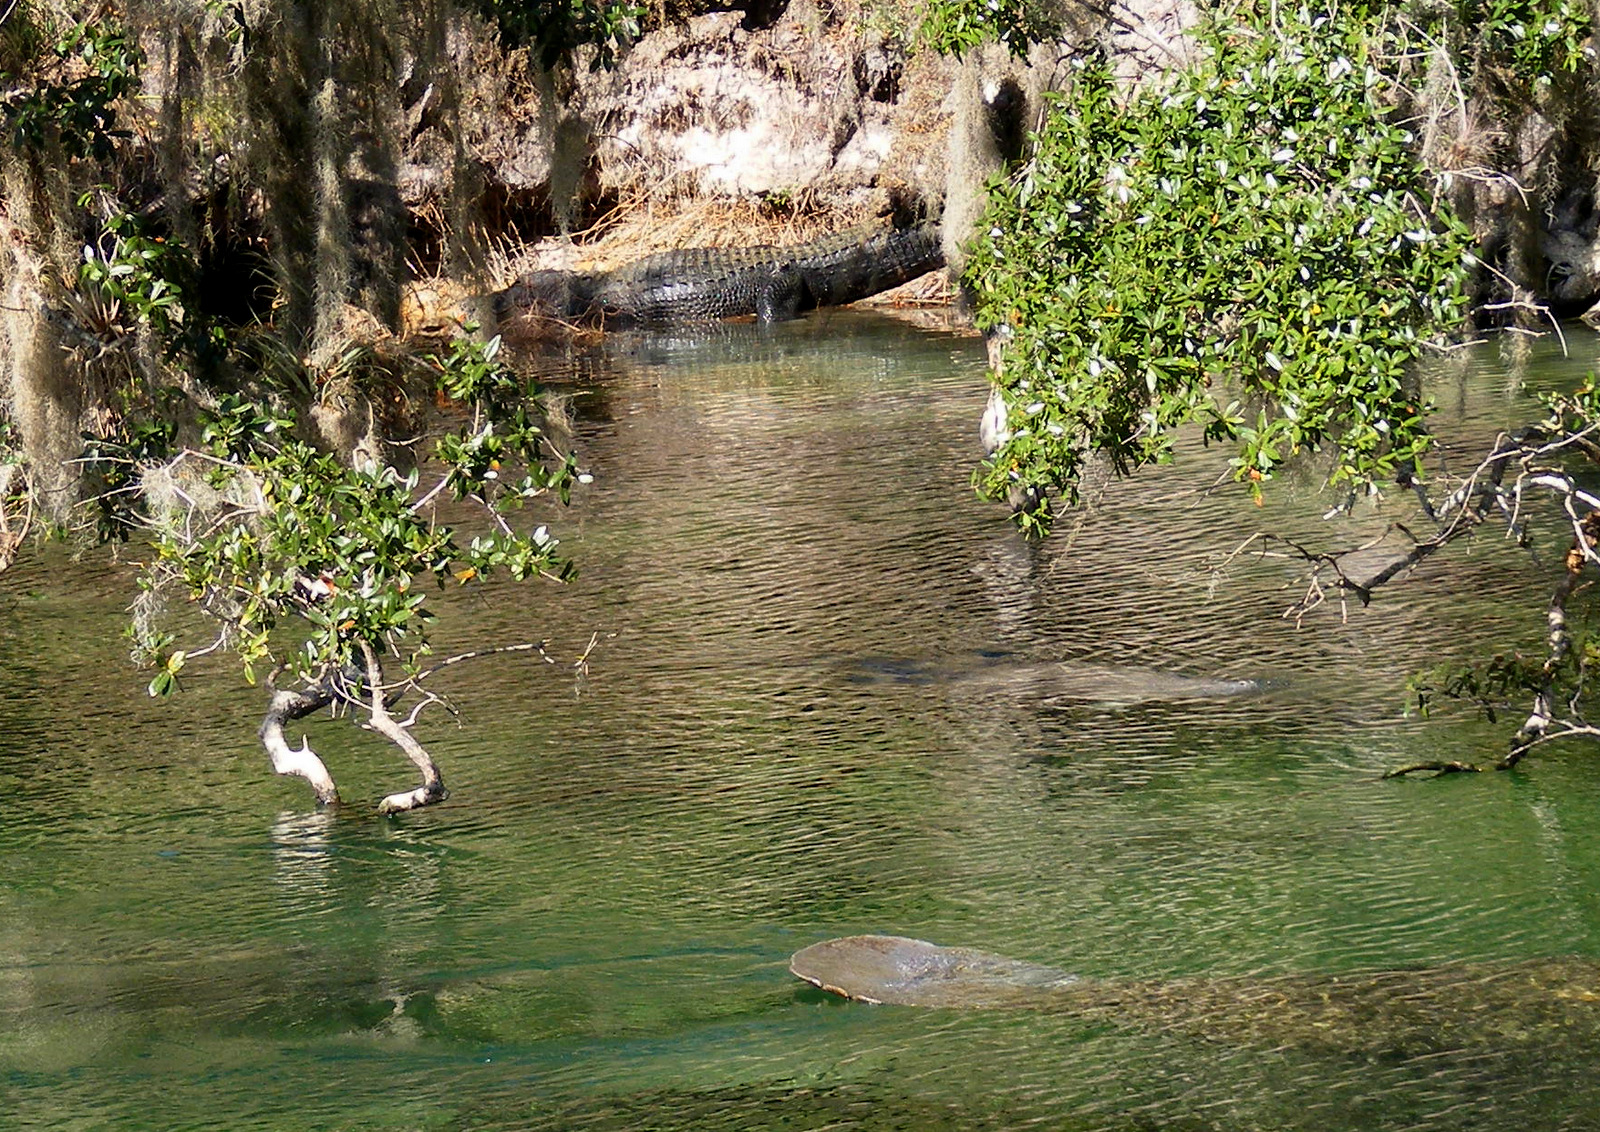 Manatee and alligator